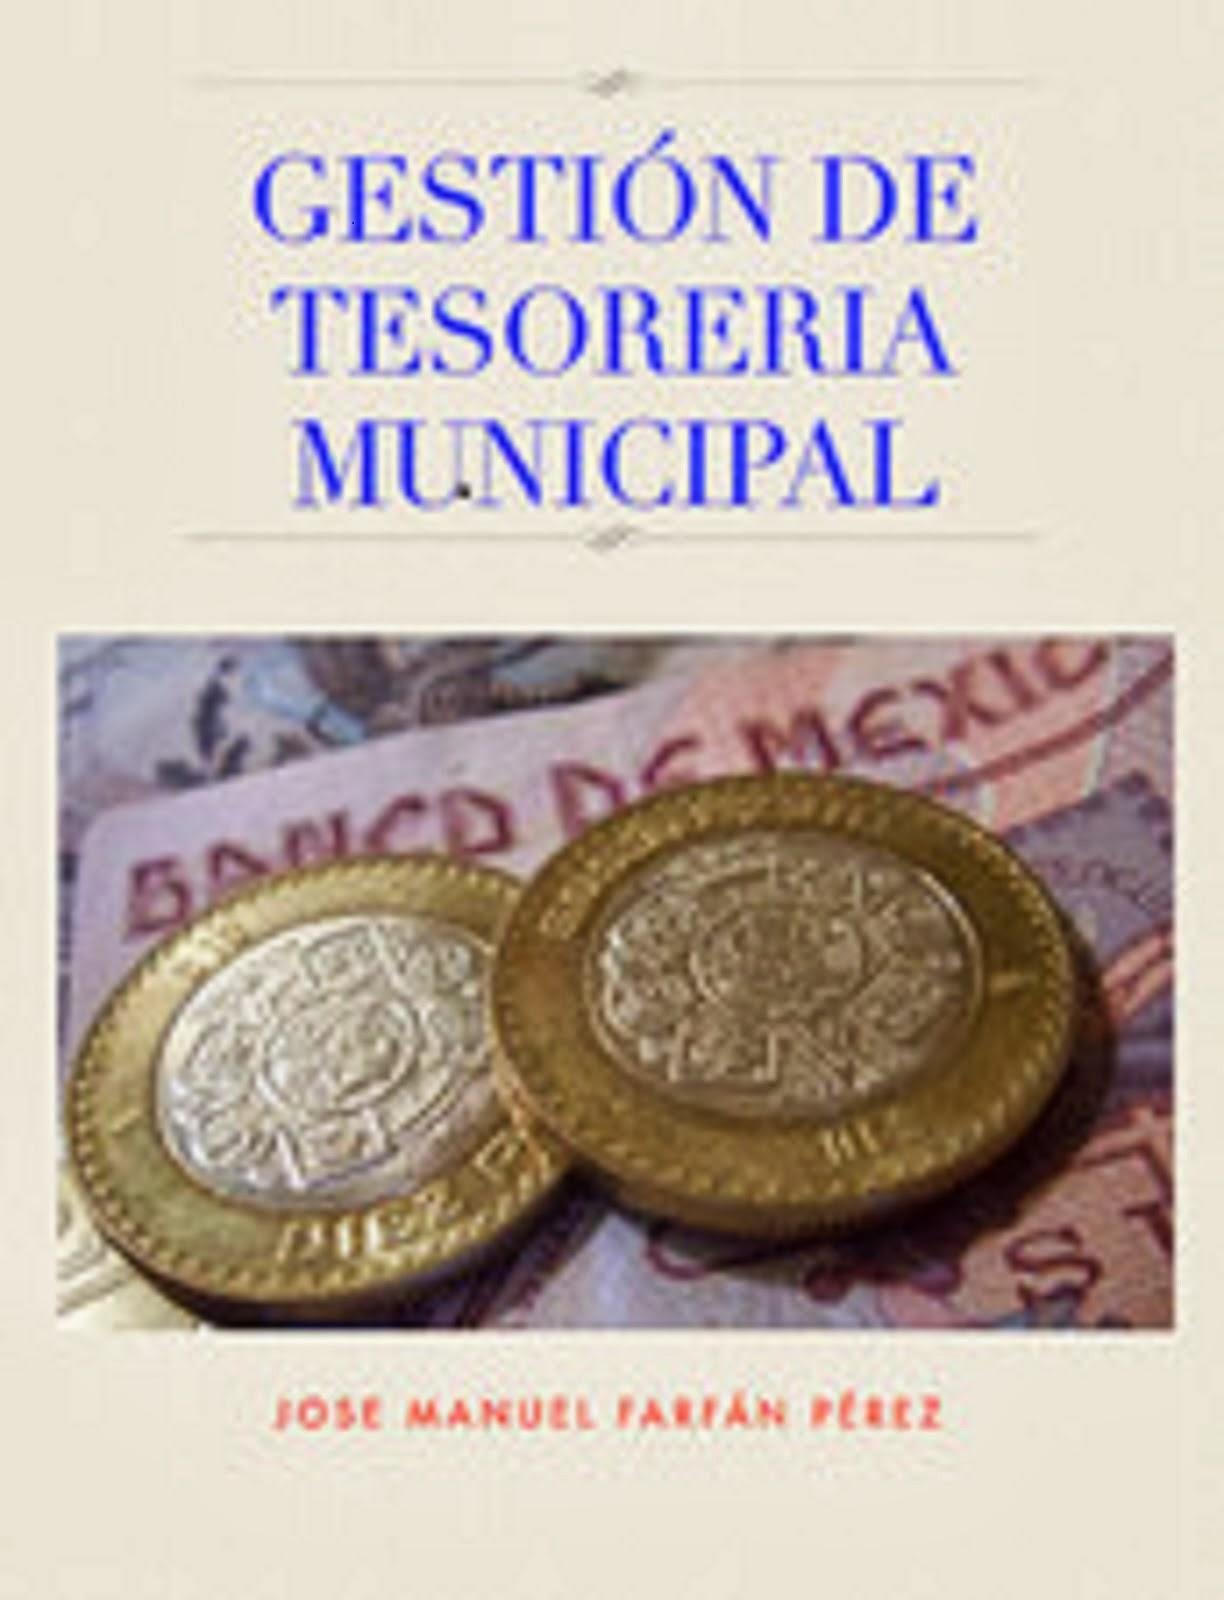 GESTIÓN DE TESORERÍA MUNICIPAL